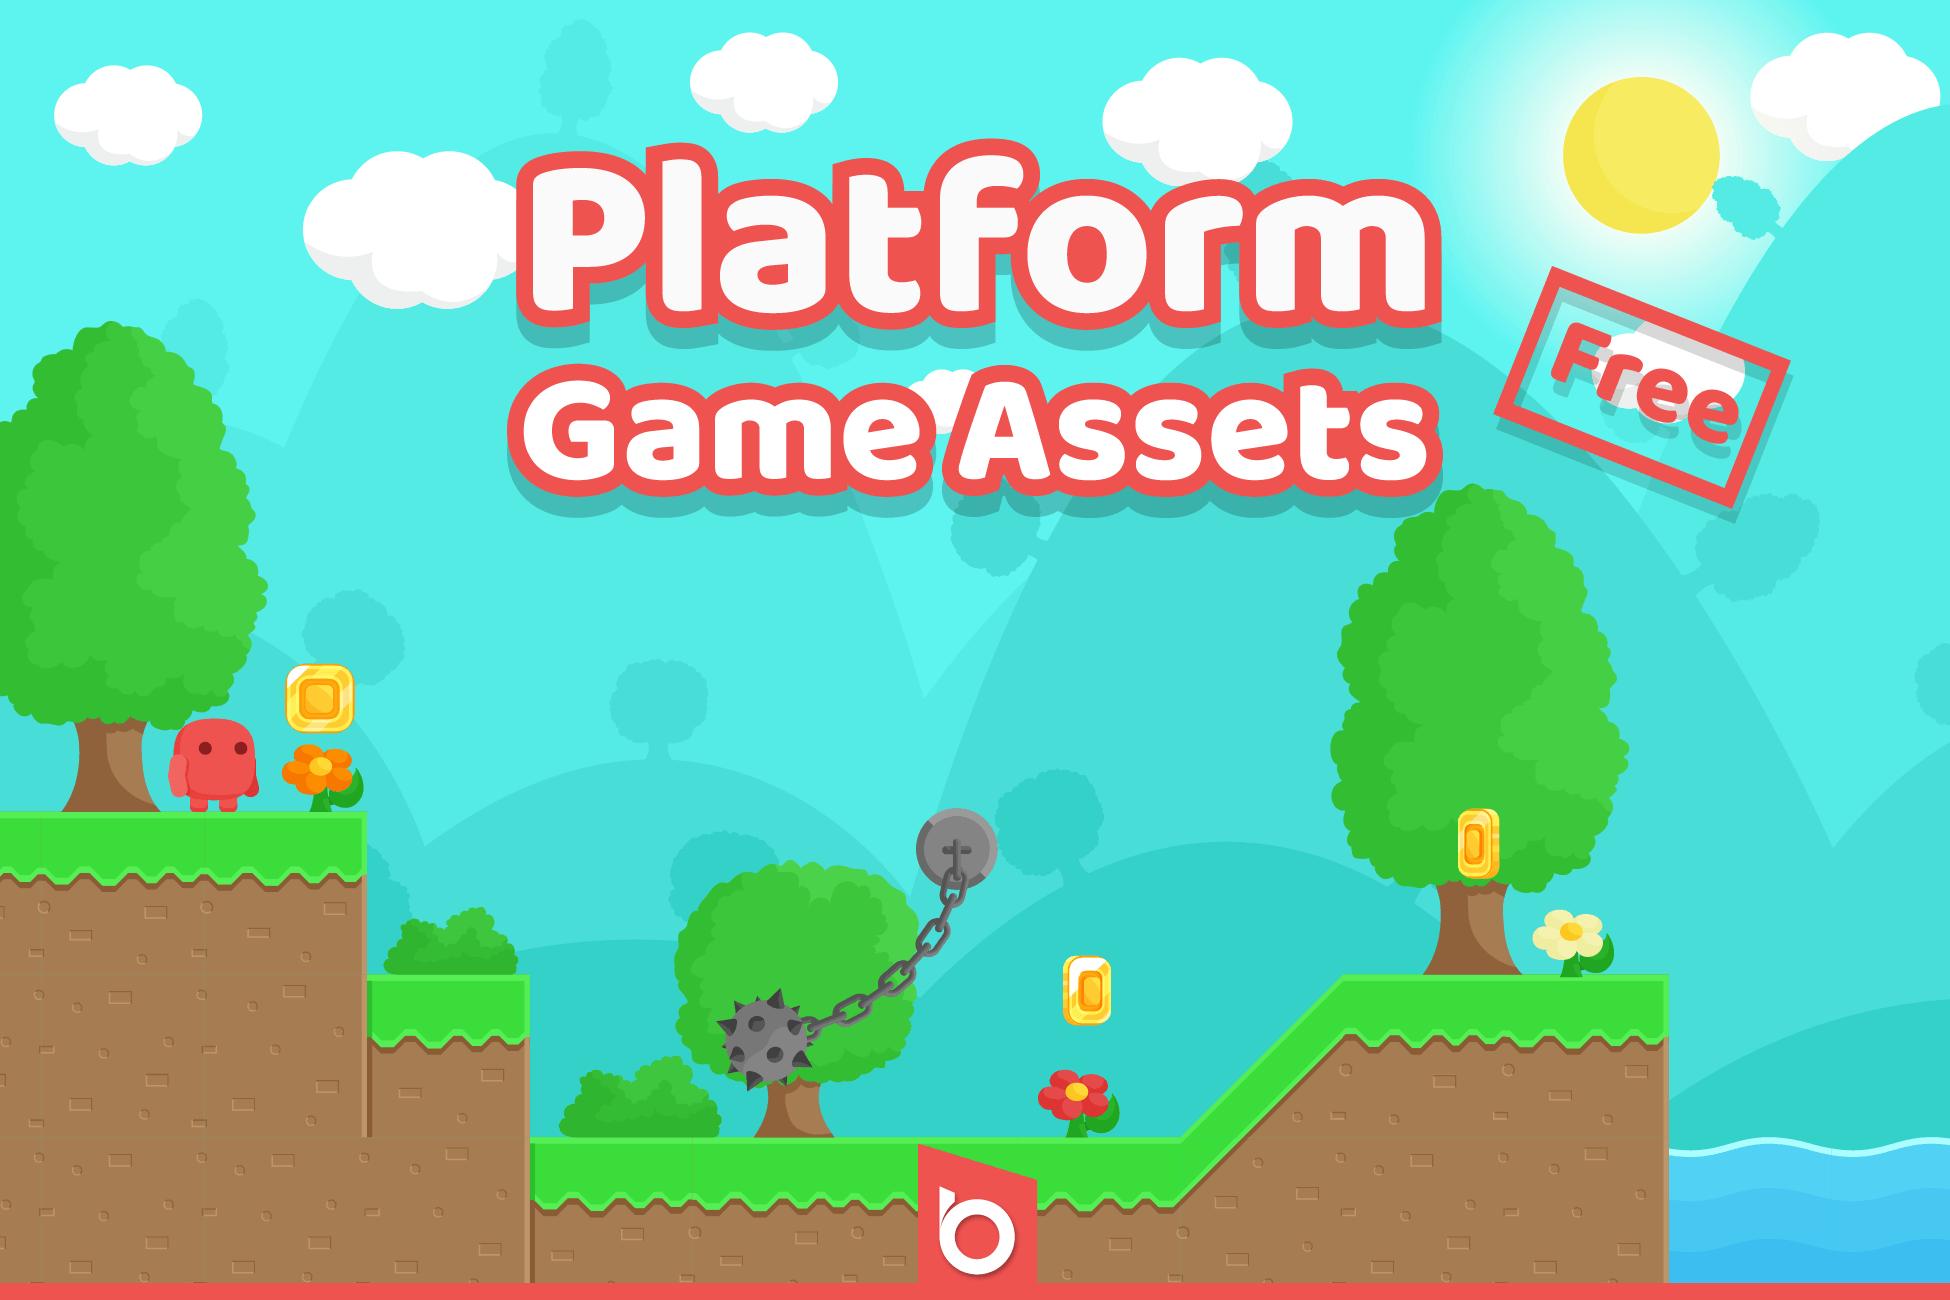 Free Platform Game Assets Gui By Bayat Games